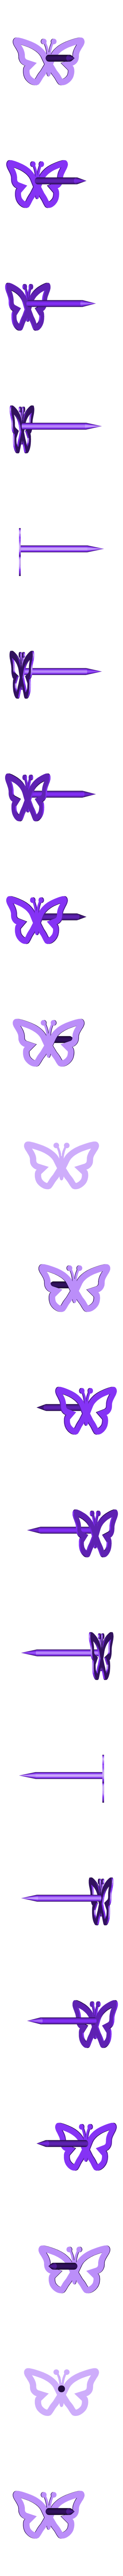 attache papillon.stl Download free STL file butterfly nail • 3D print design, frednad